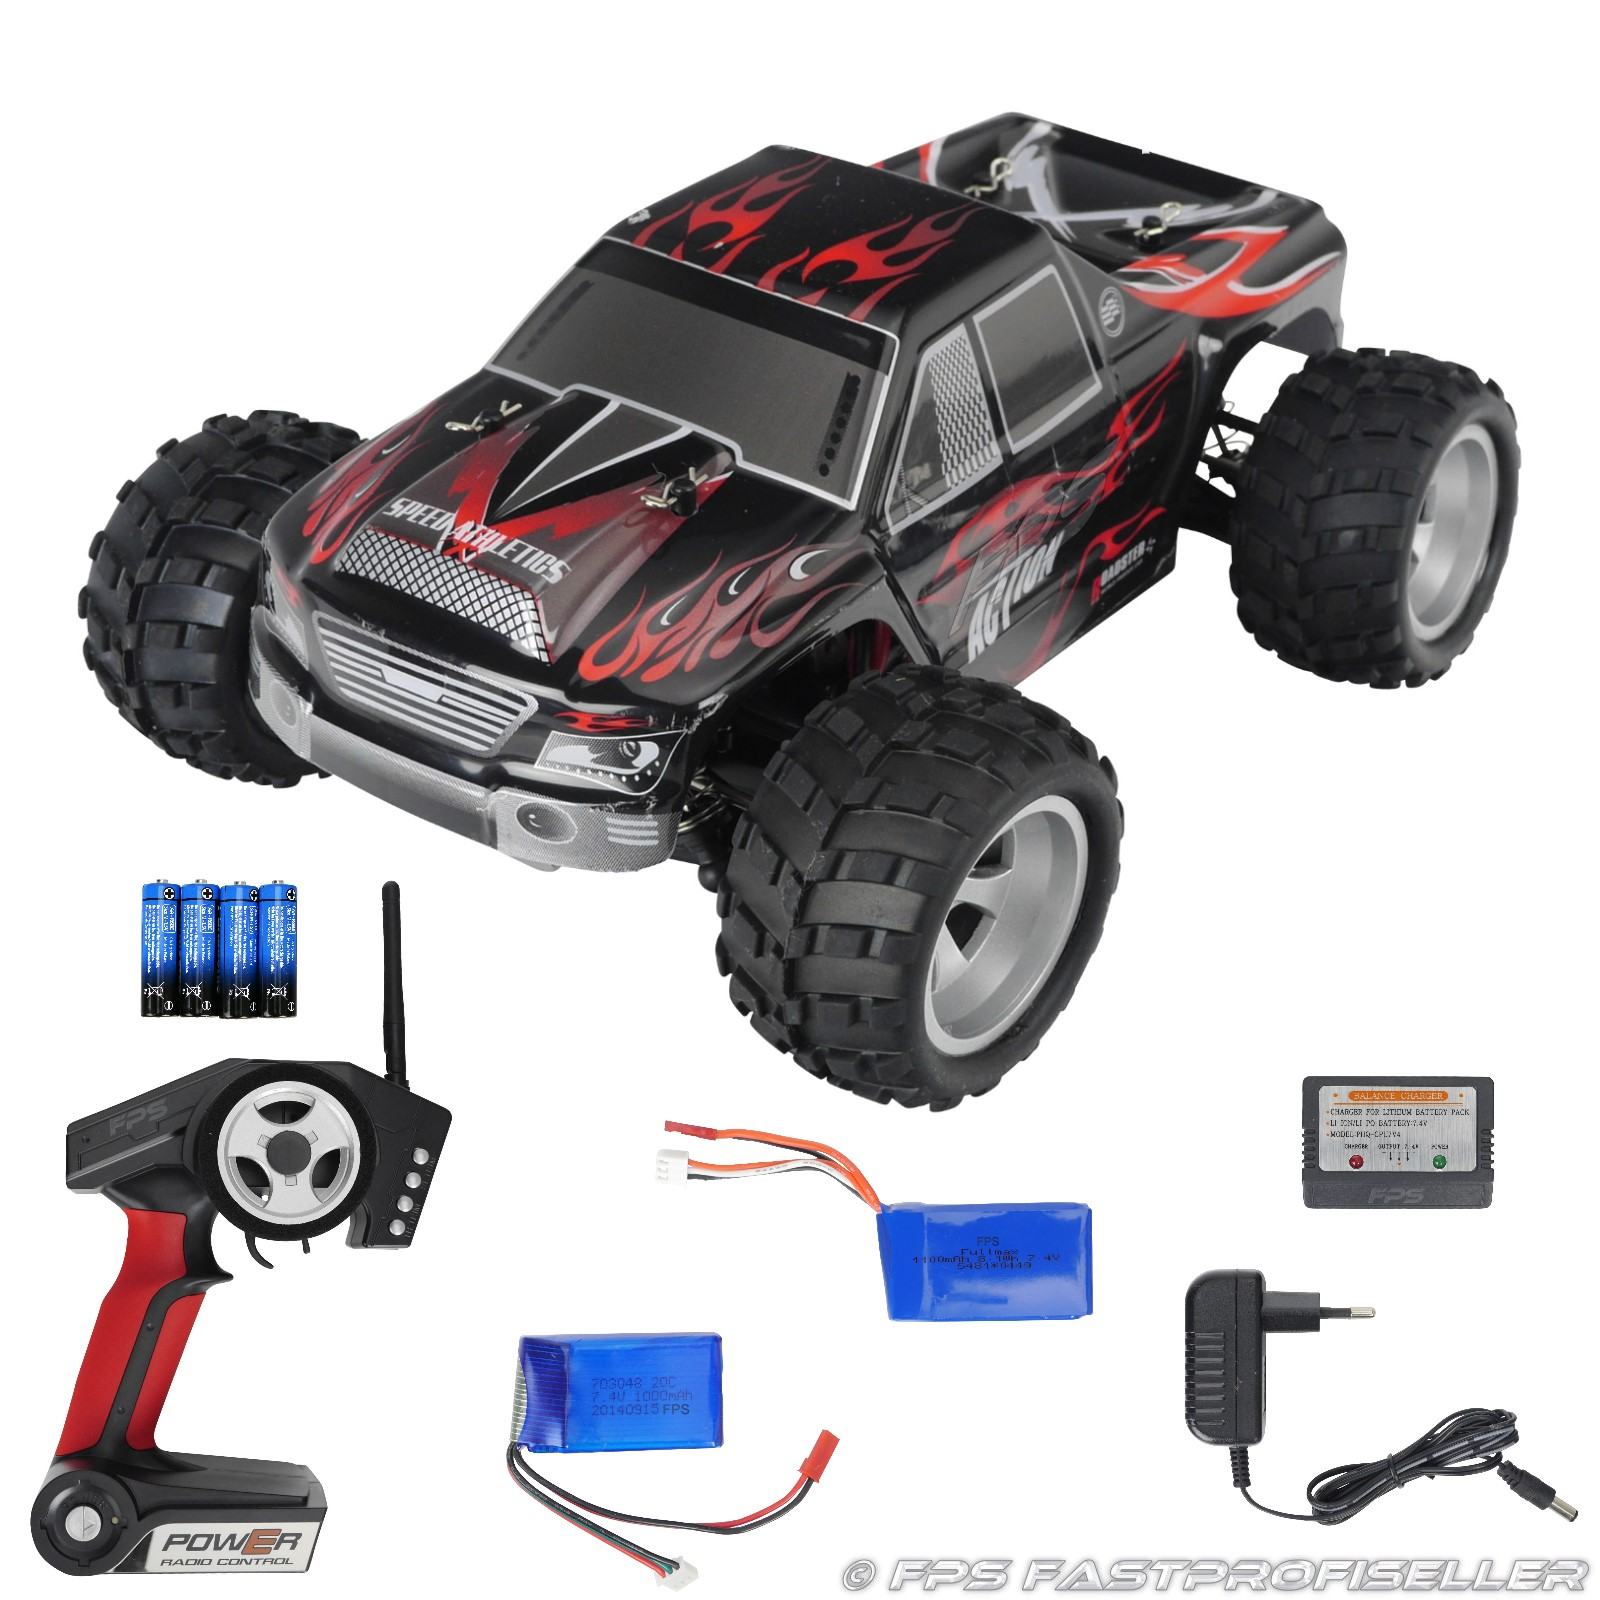 Rayline Funrace 01 FR01 RC Monster Truck mit Zubehör 2x Akku